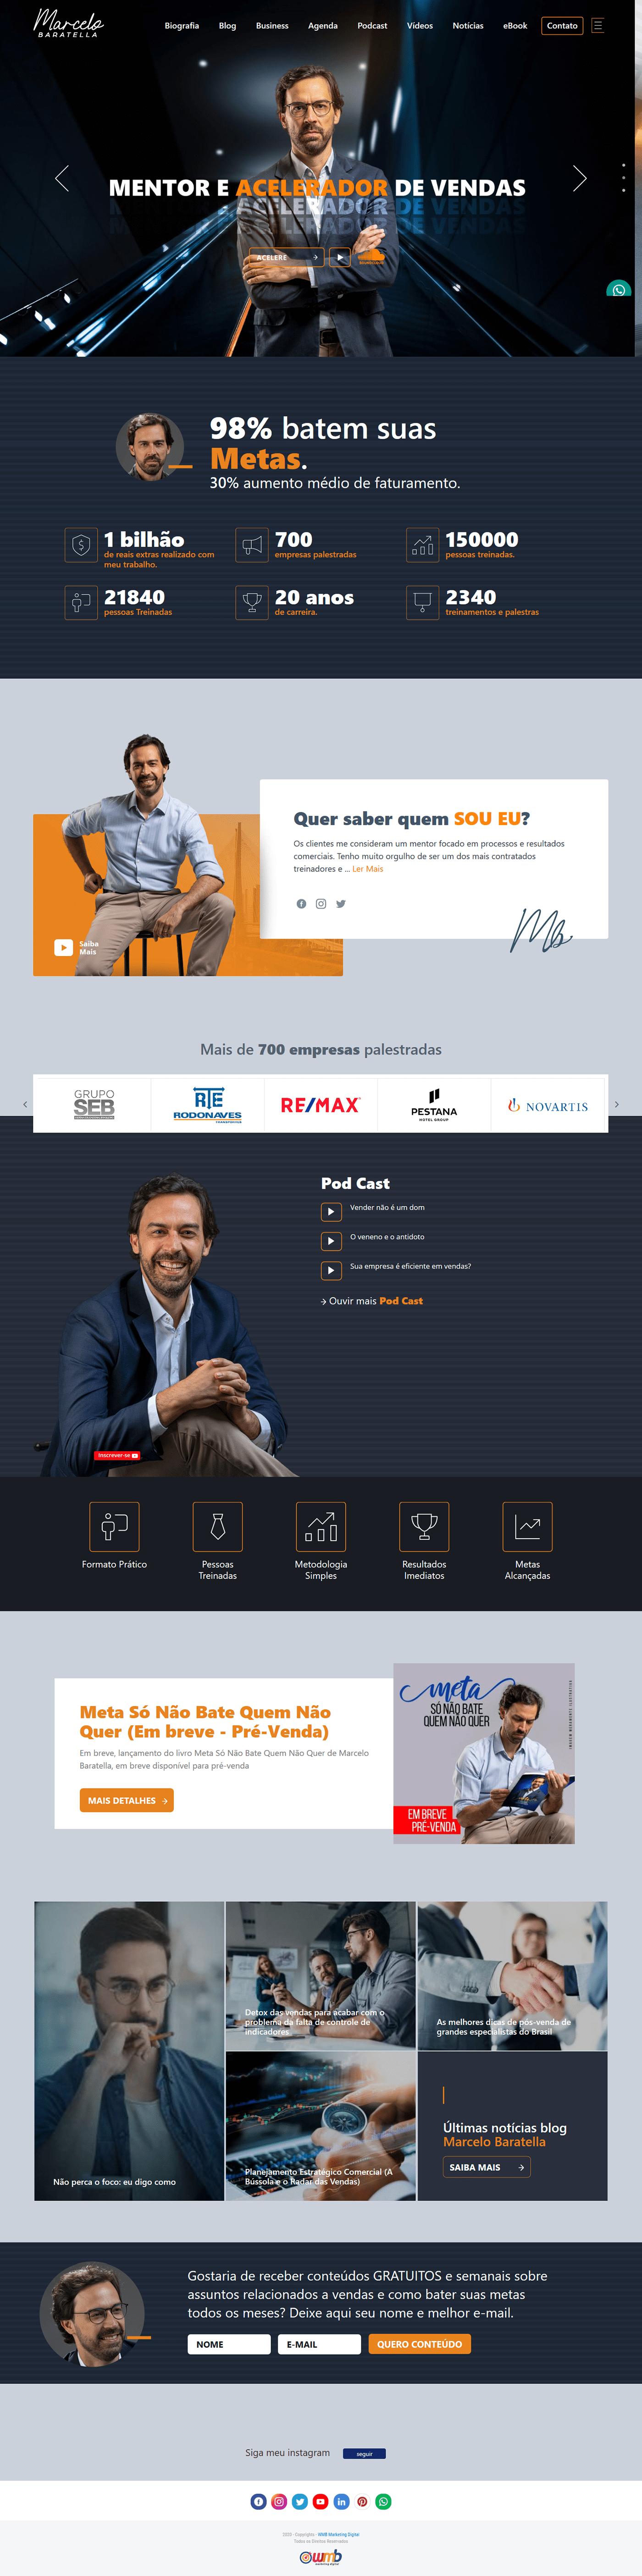 Coach Mentor palestrante site vendas